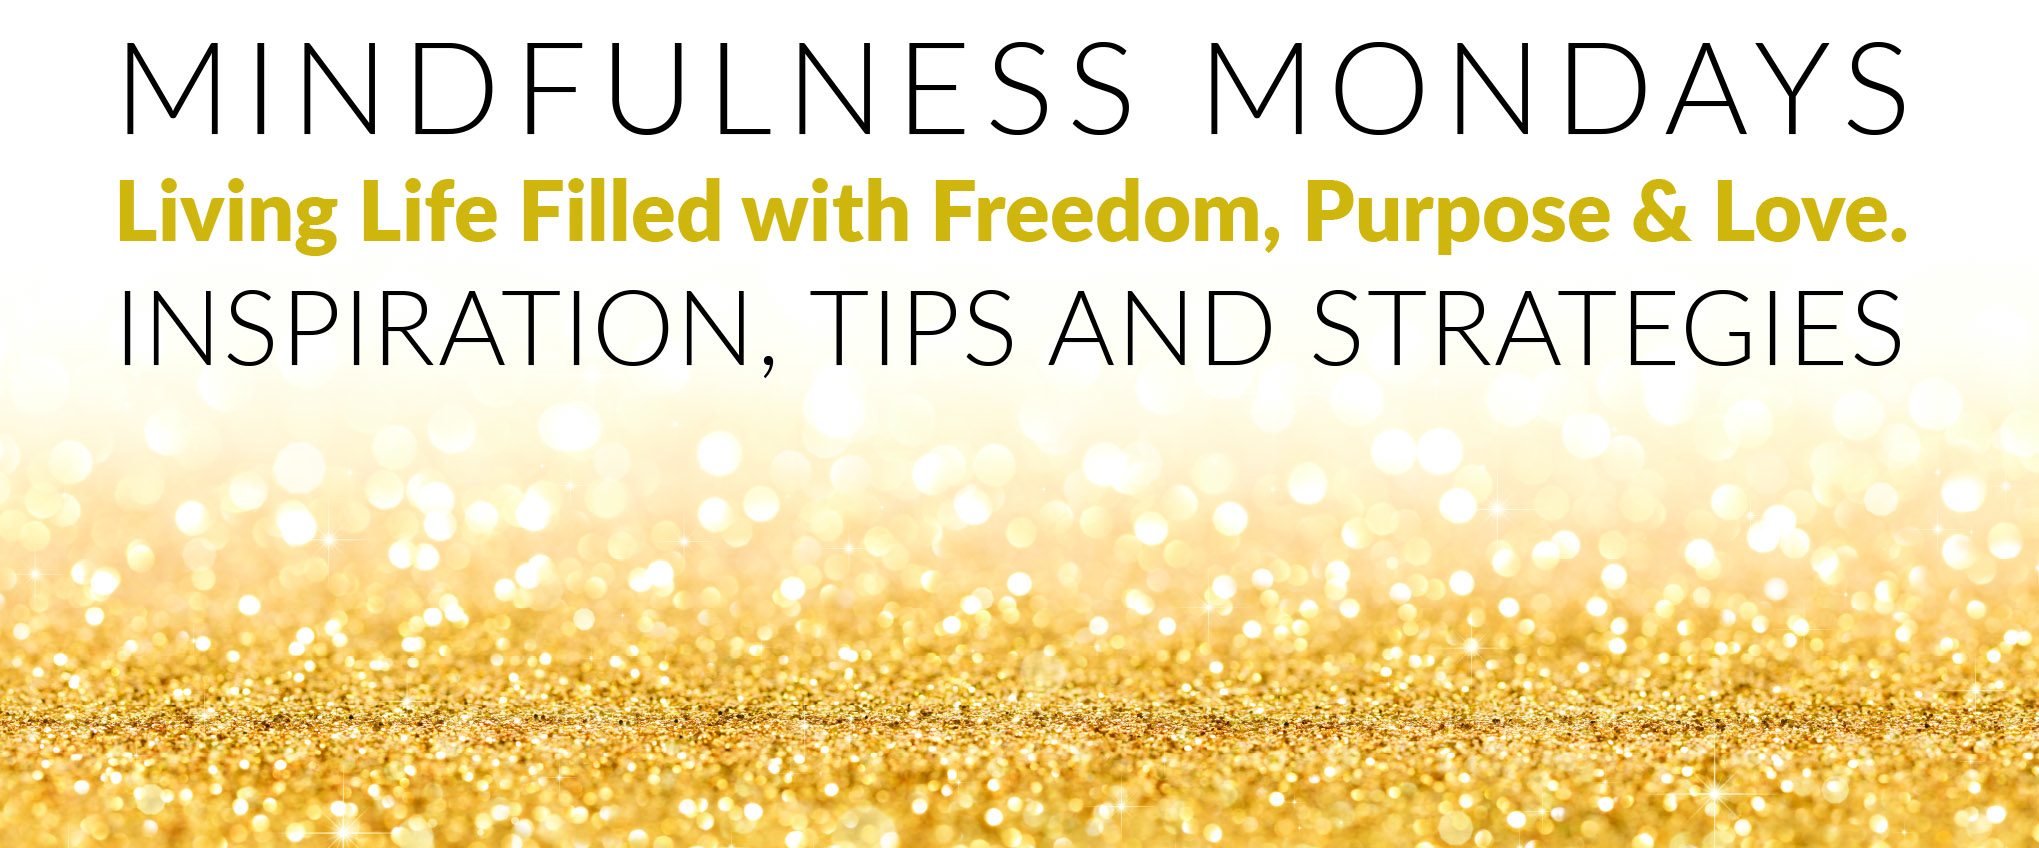 Mindfulness Mondays Masthead.jpg